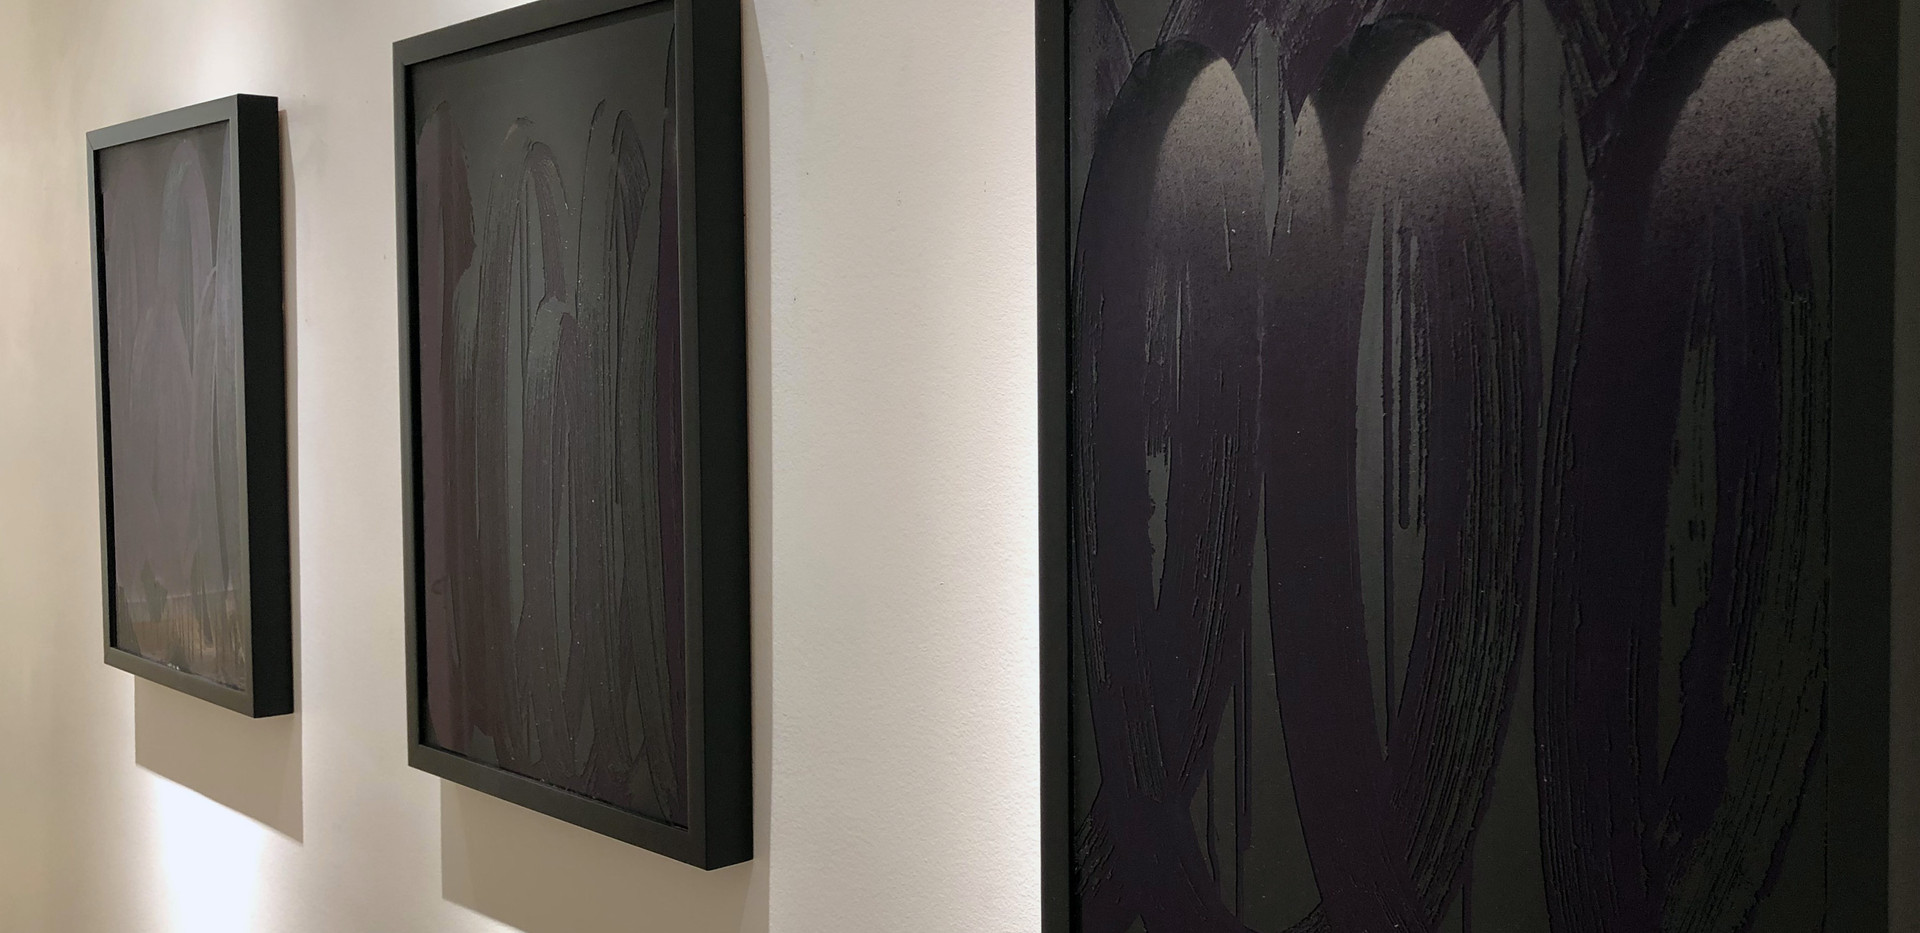 Franck Noto, Corridor, 5